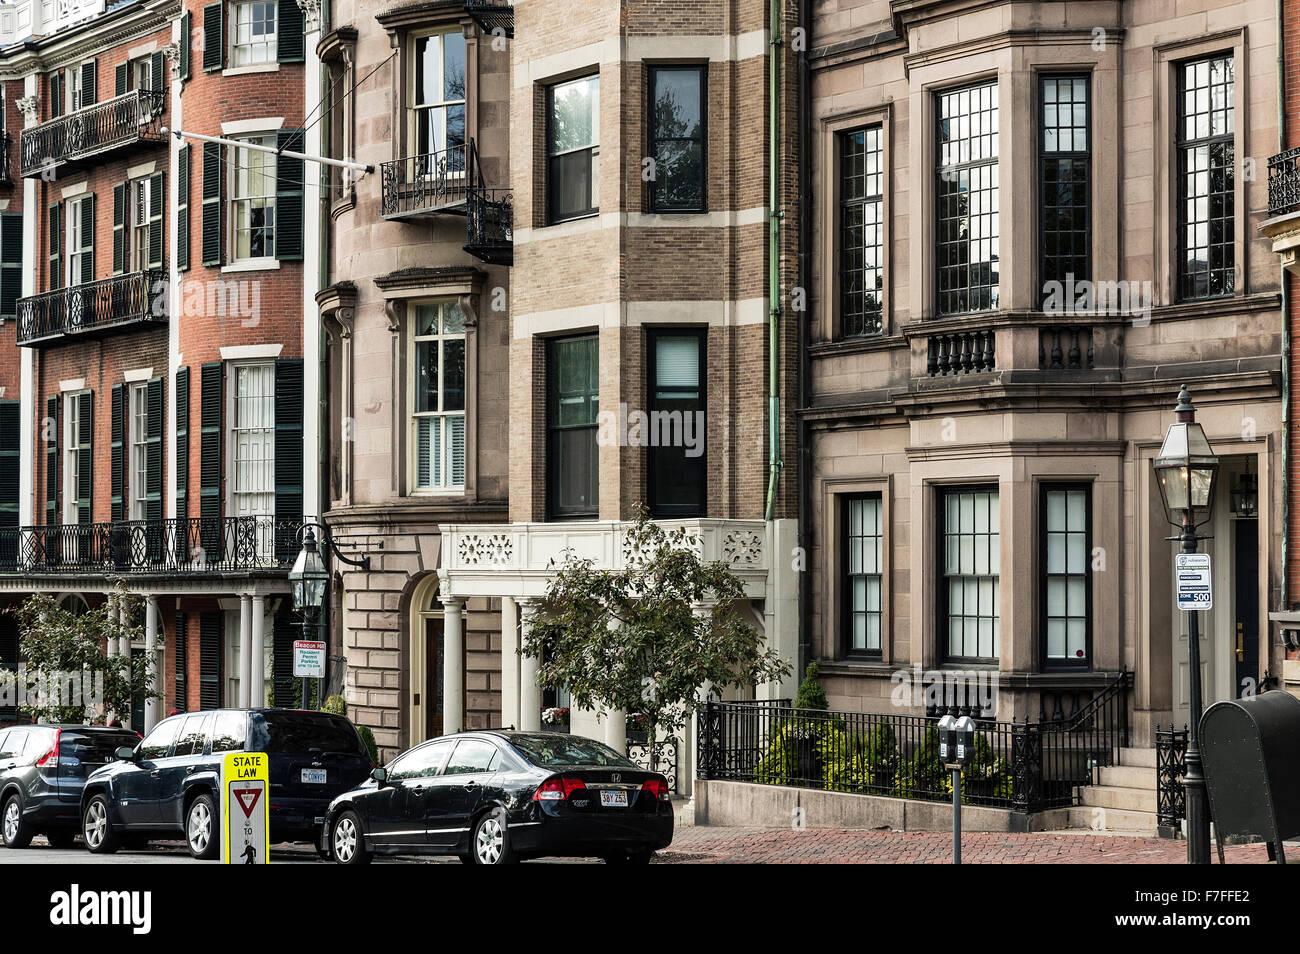 Brownstone casas a lo largo de Beacon Street, Beacon Hill, Boston, Massachusetts, EE.UU. Imagen De Stock